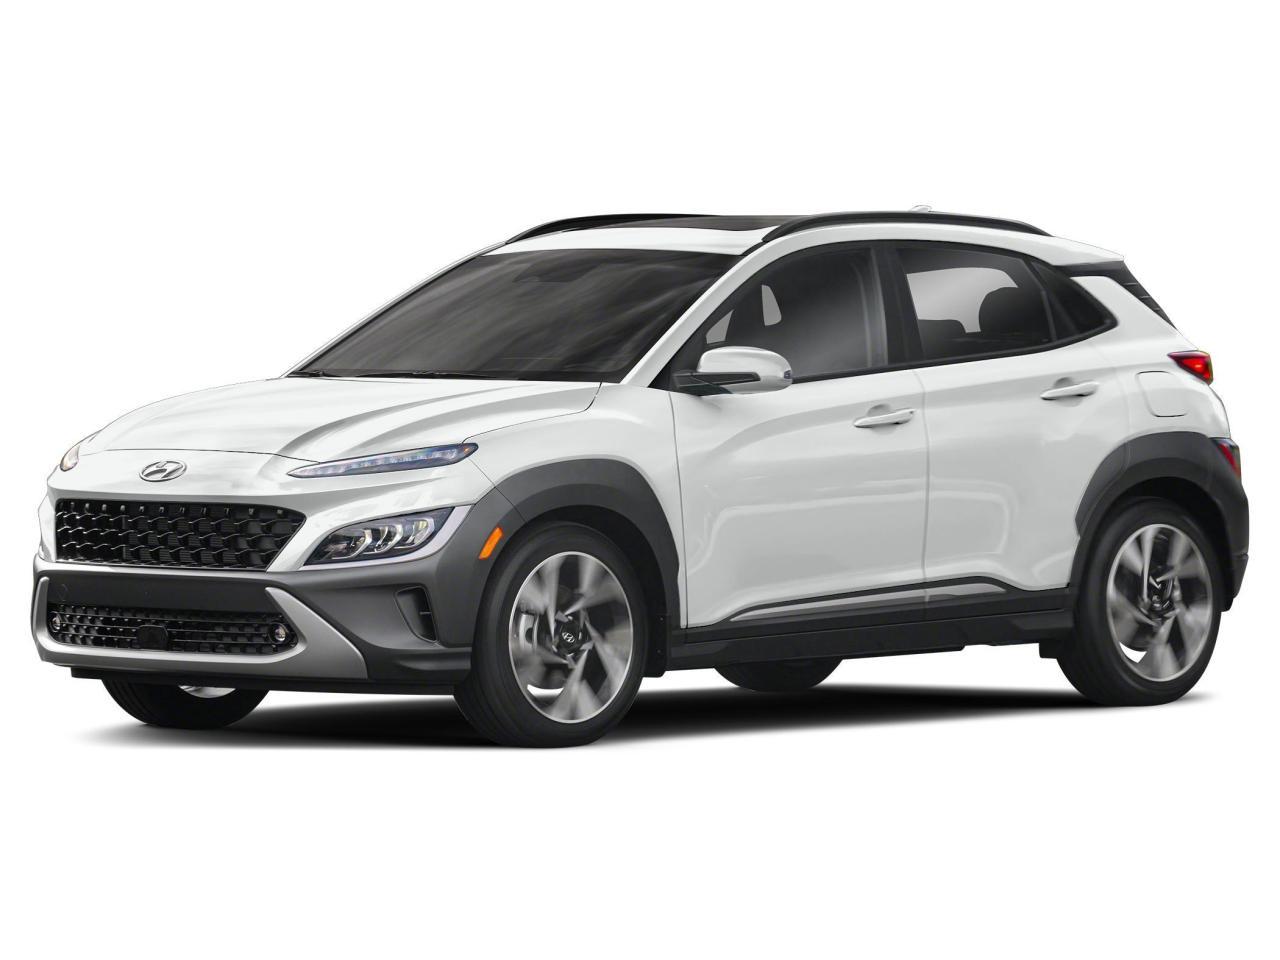 2022 Hyundai KONA 2.0L AWD Preferred NO OPTIONS